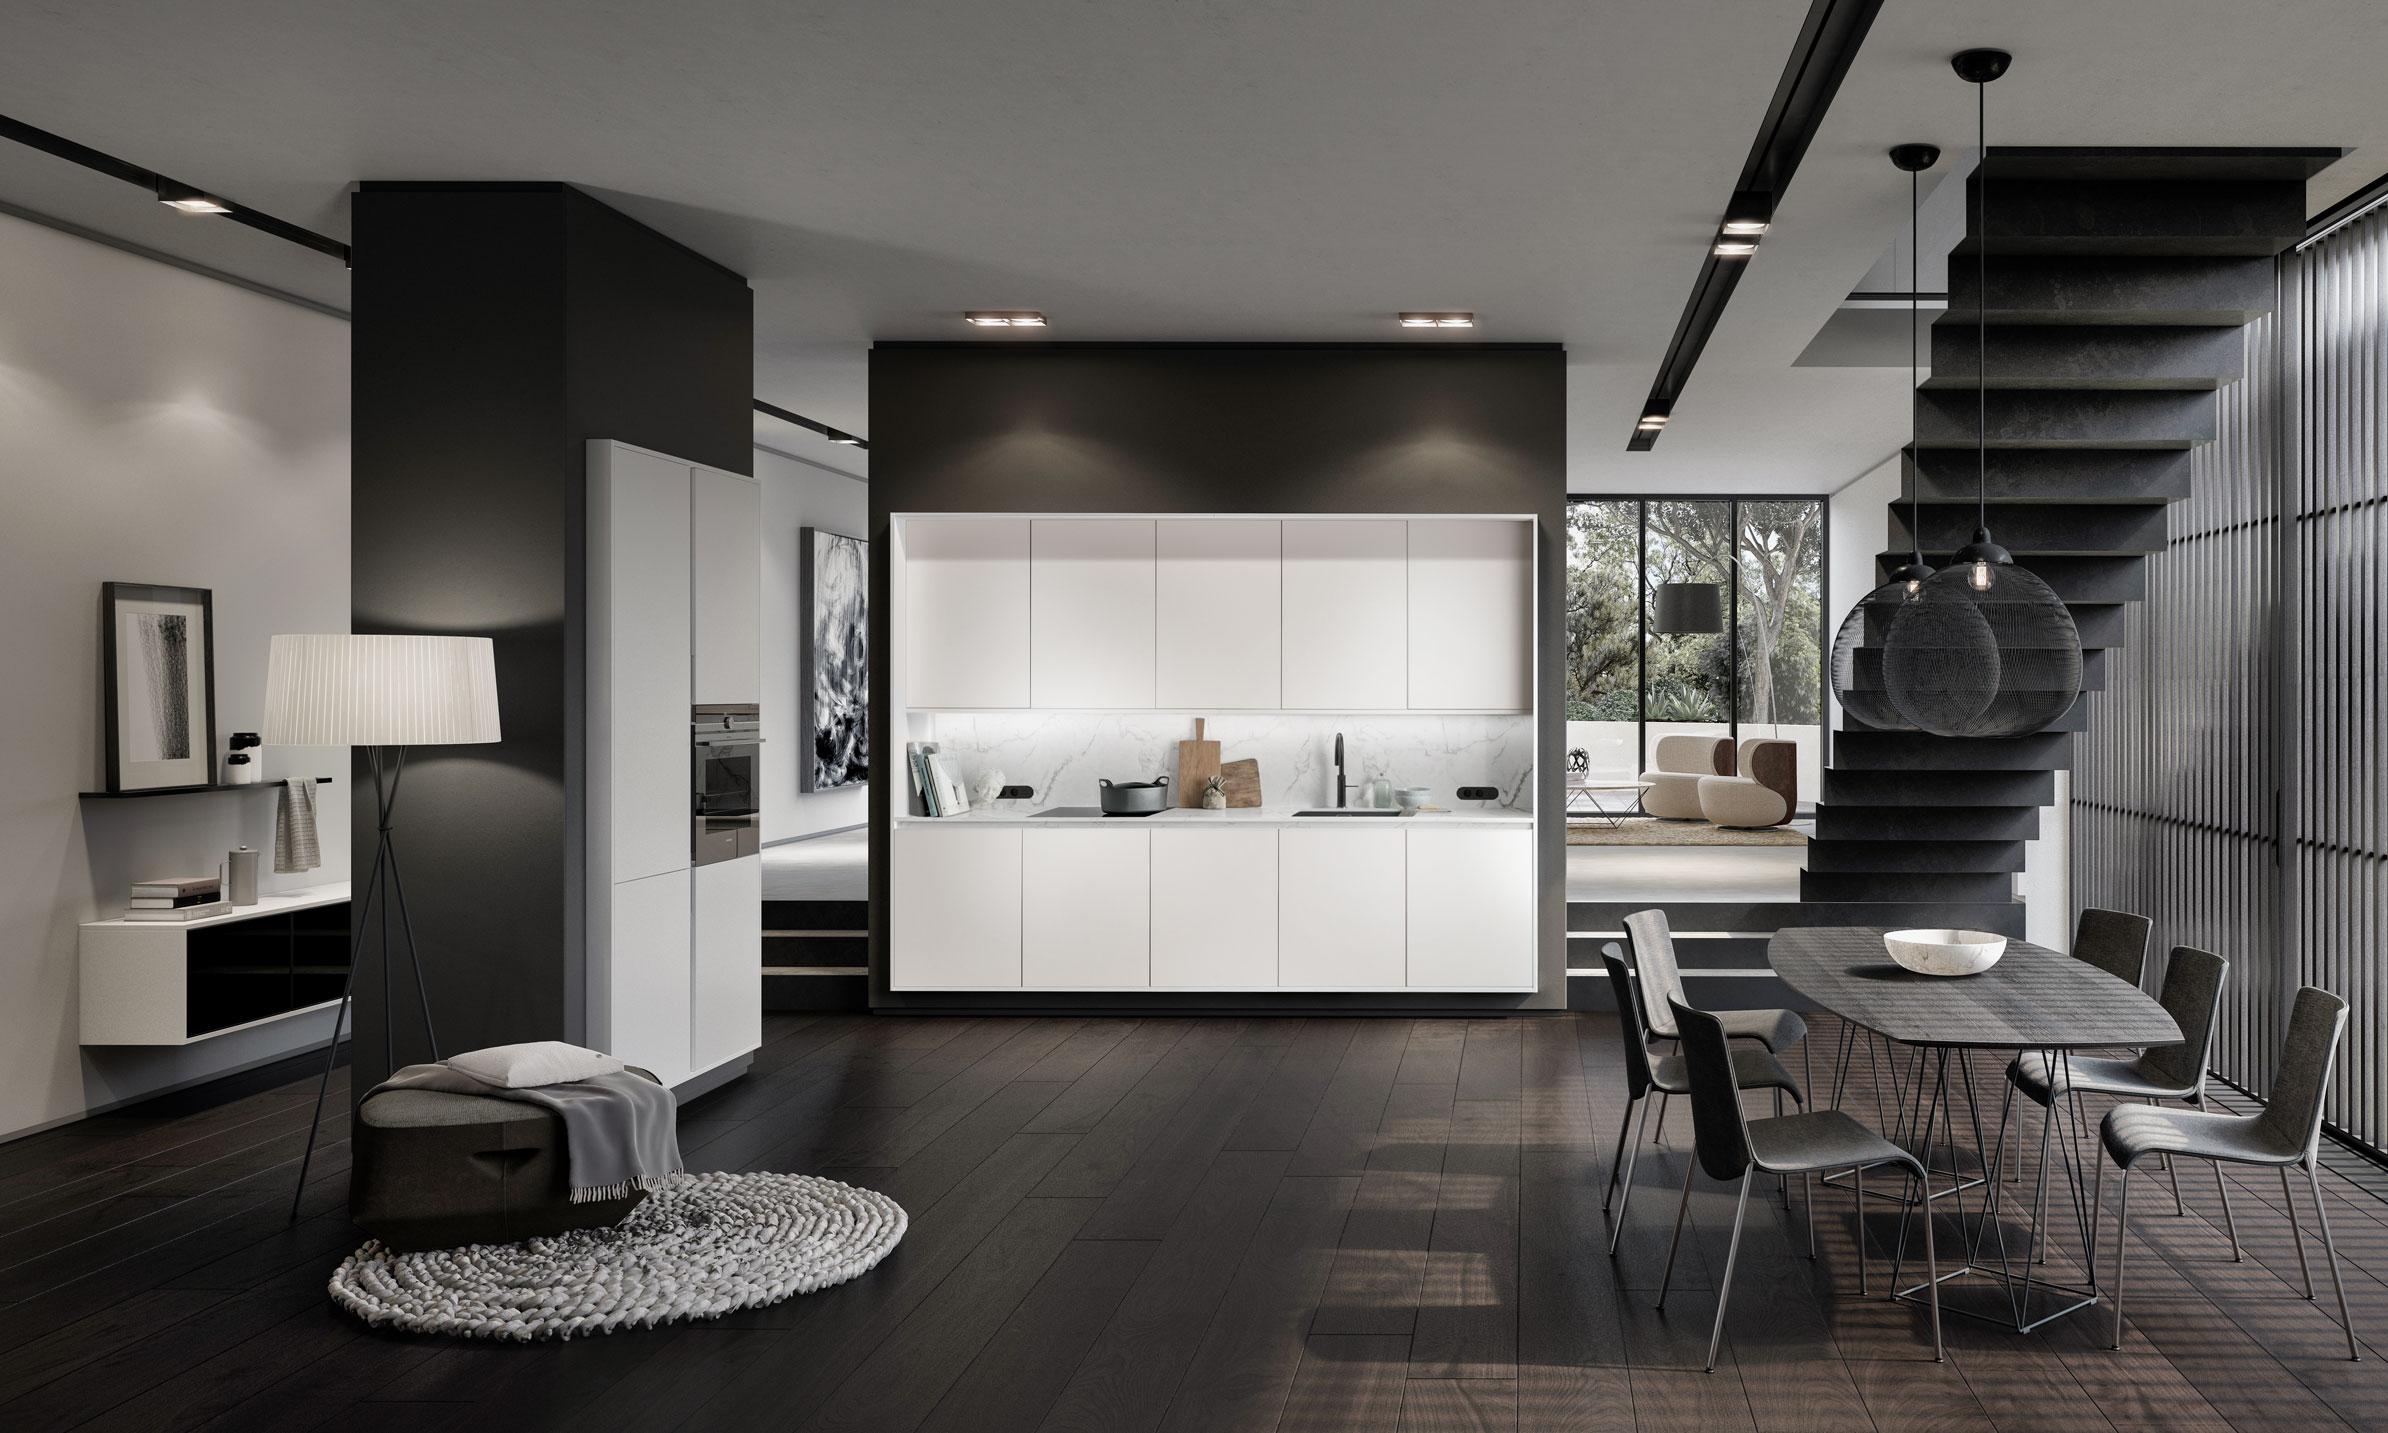 Livingkitchen 2019 - Black owned interior design companies ...